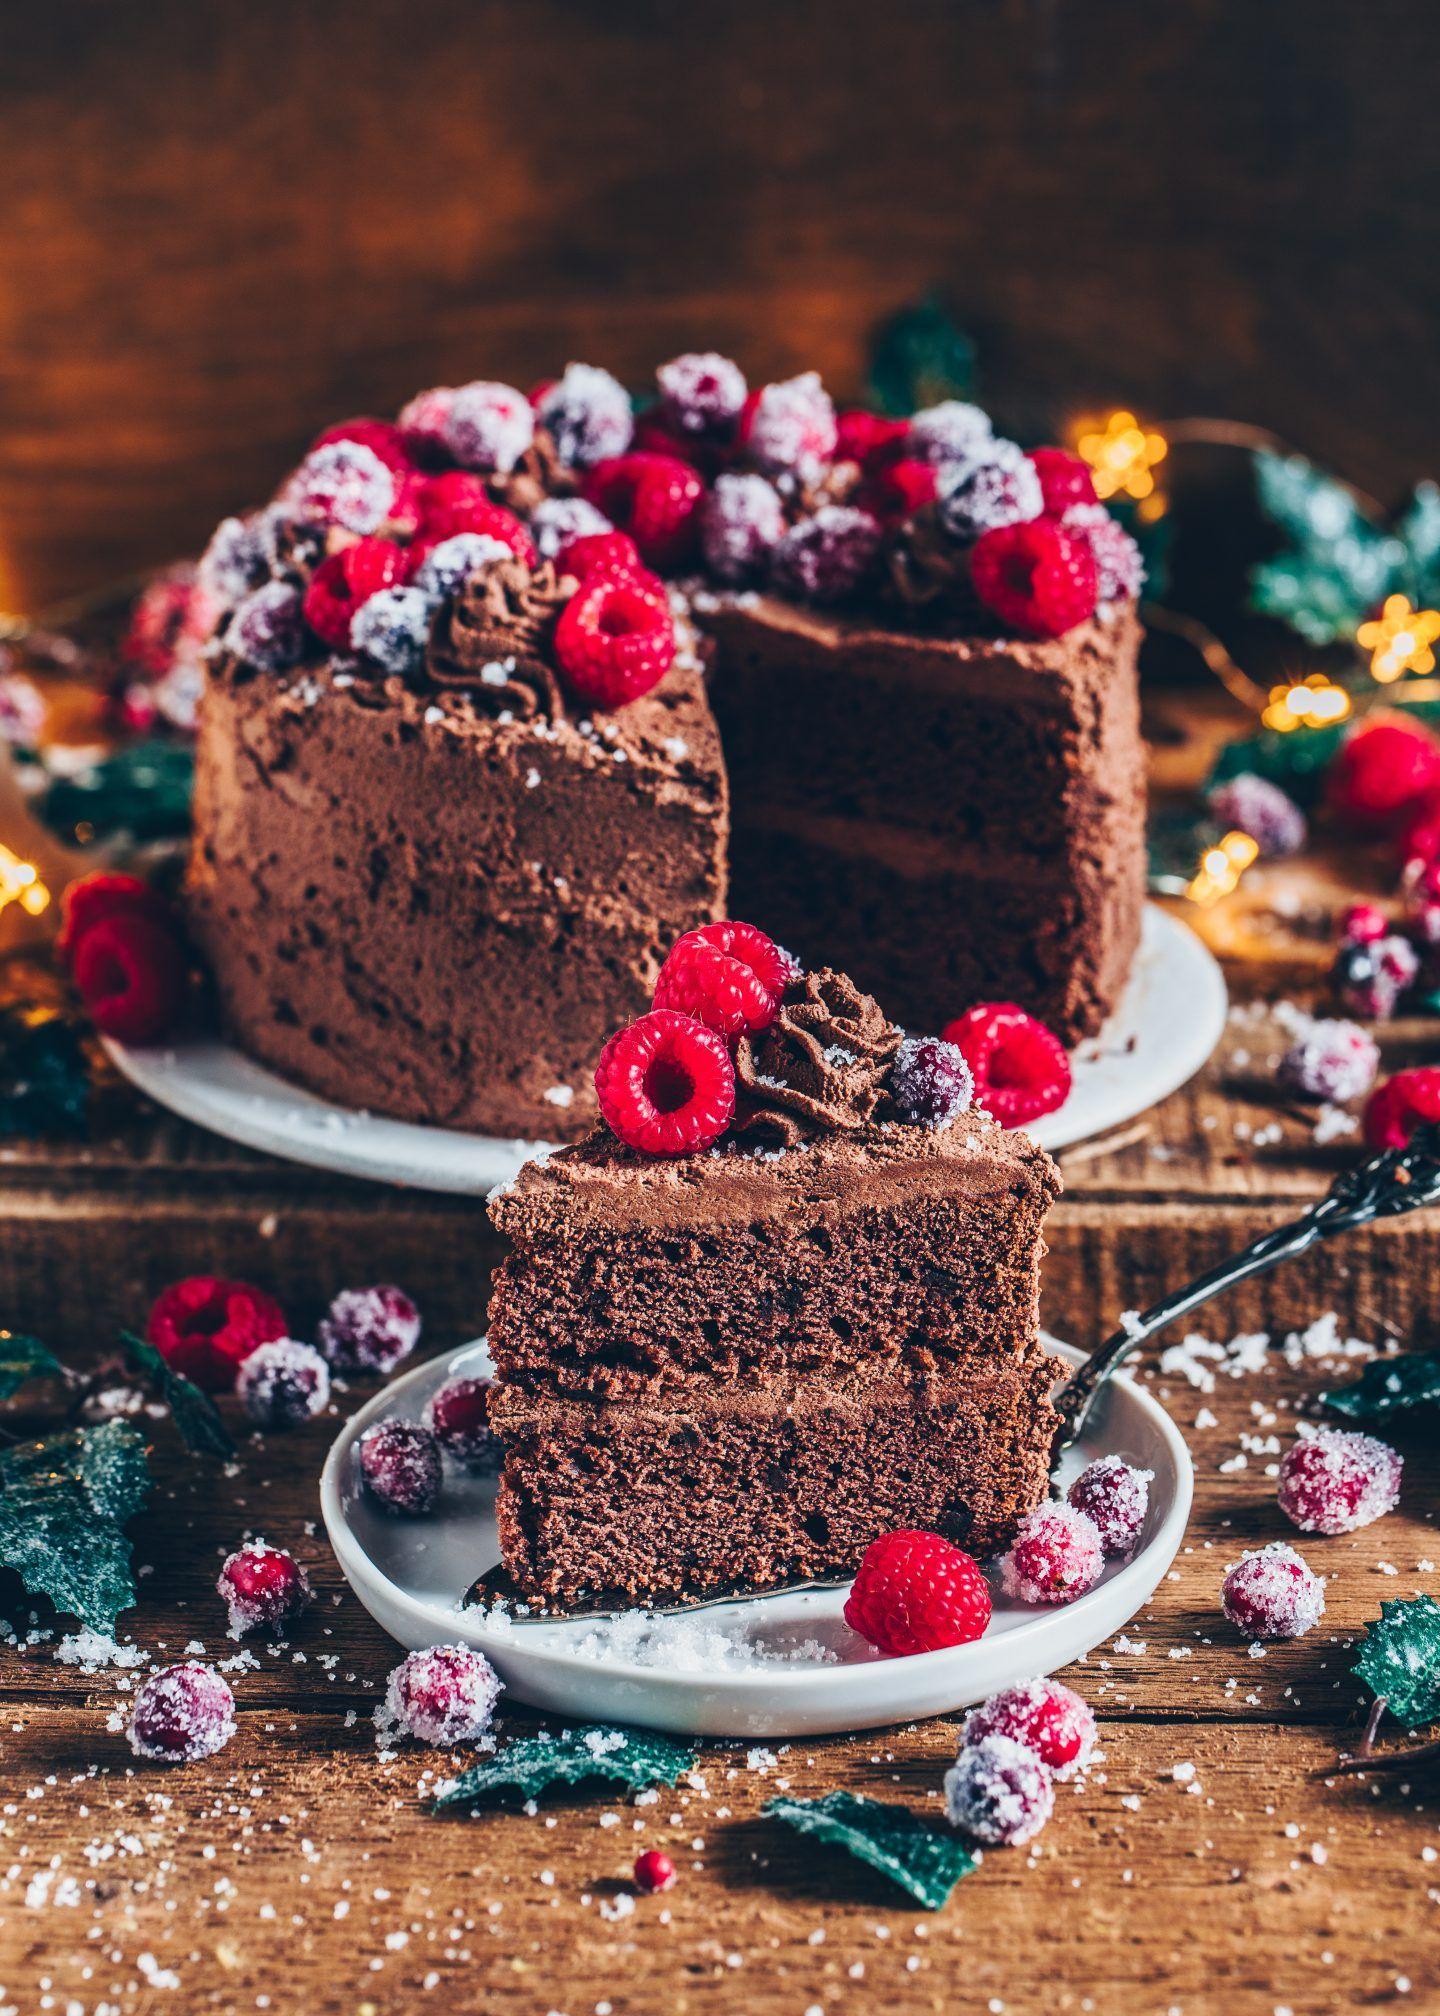 Best Vegan Chocolate Cake Recipe Vegan chocolate, Best